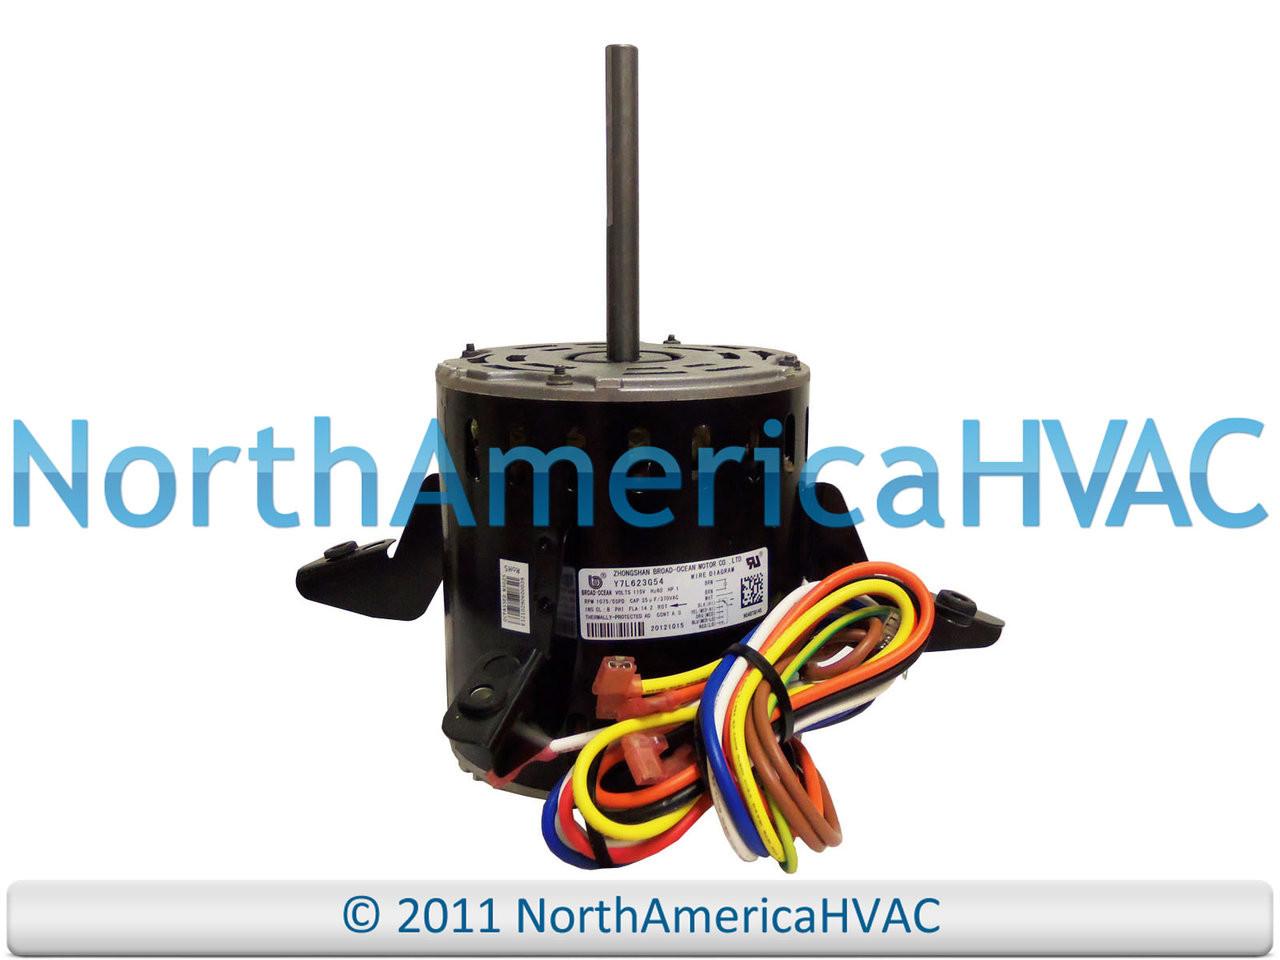 Oem Carrier Bryant Payne 1 Hp 115v Furnace Blower Motor Hc51tq145 Hvac Capacitor Wiring Diagram Y7l623g54